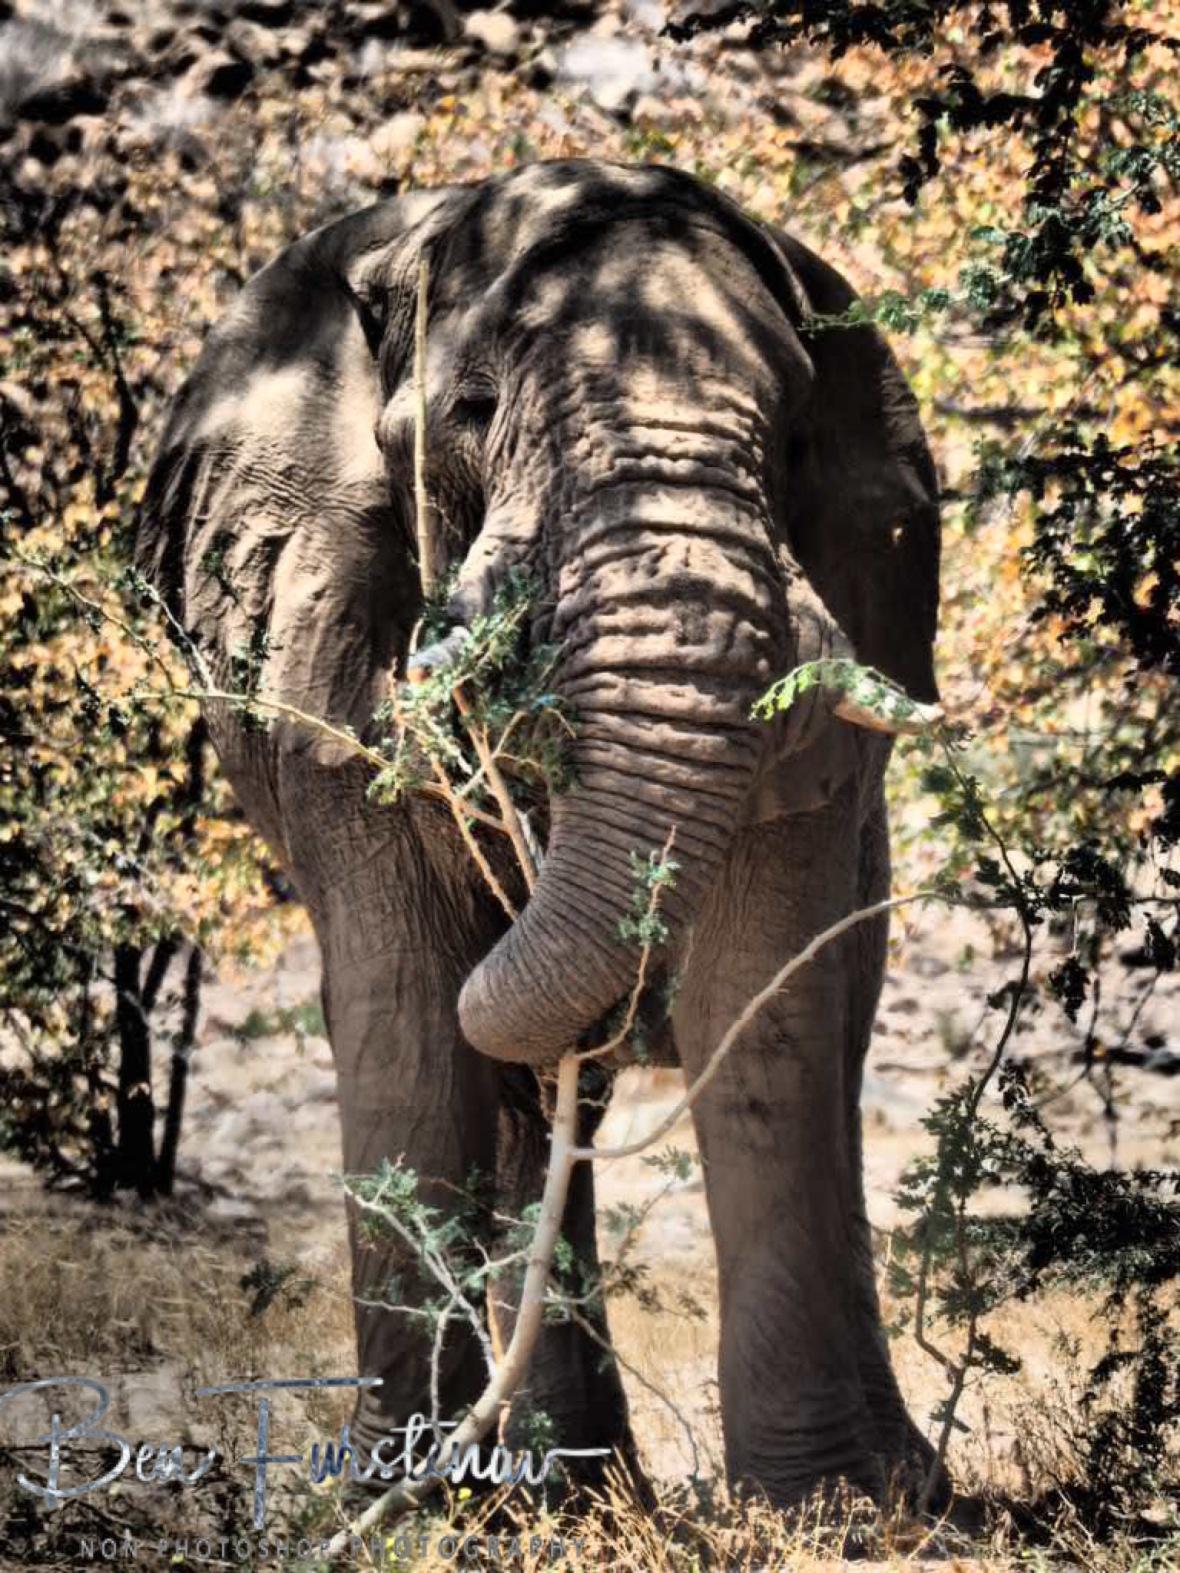 Tasty twigs, Damaraland, Namibia